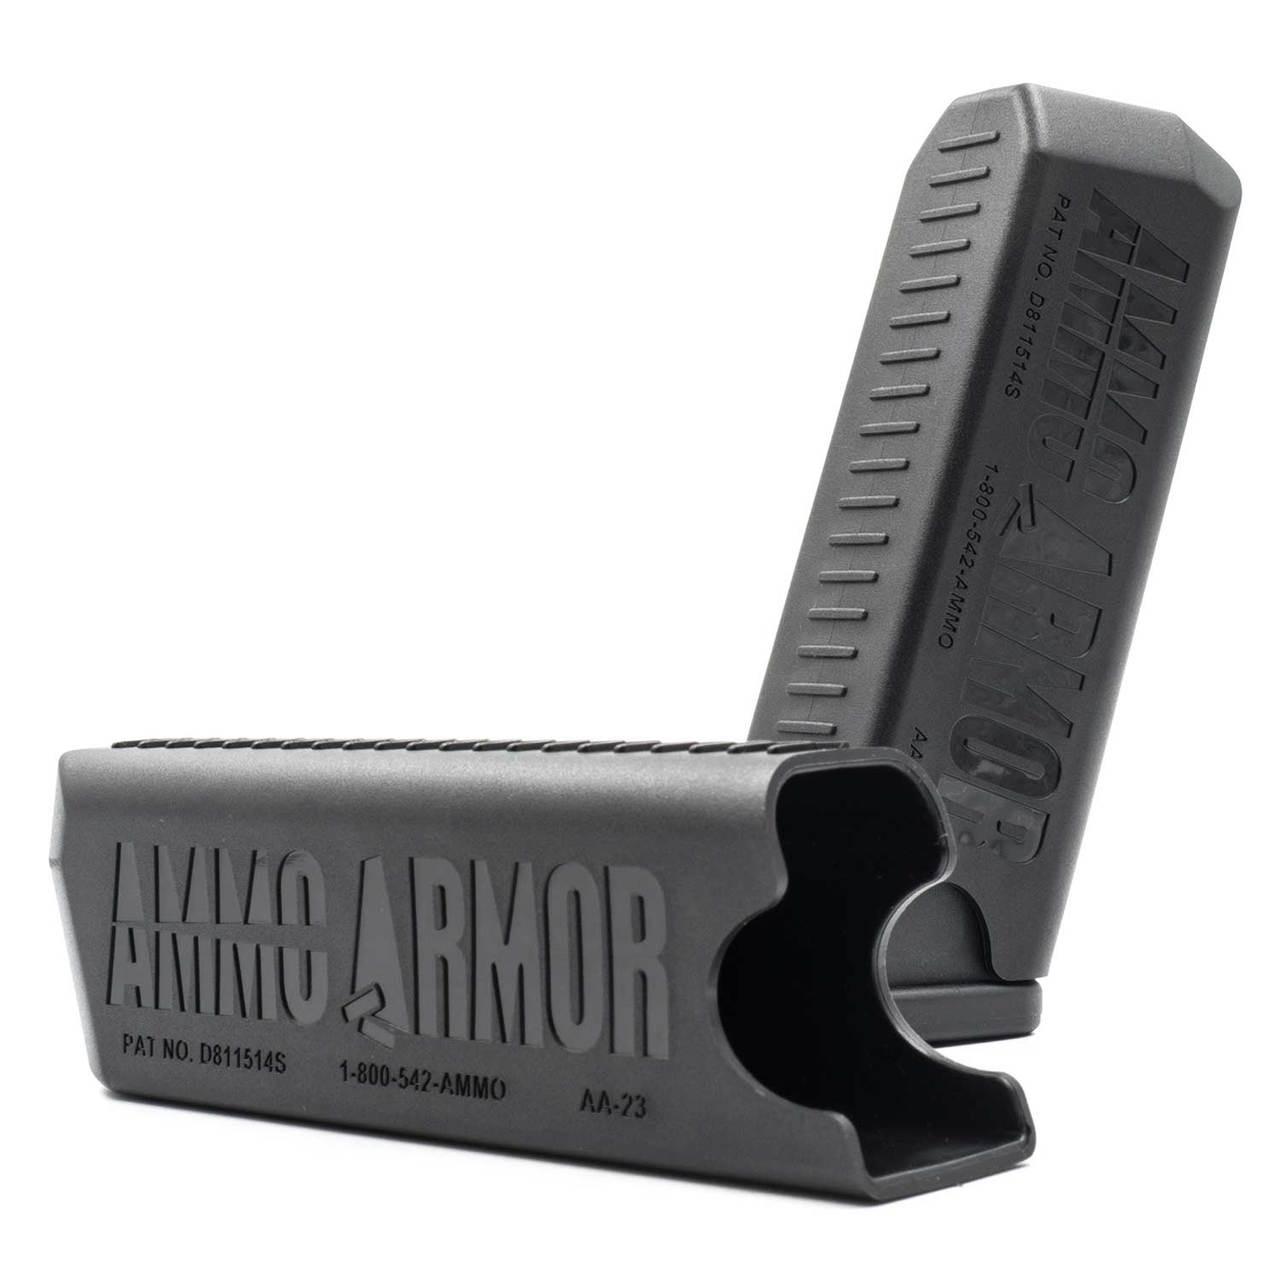 Glock G20 Ammo Armor